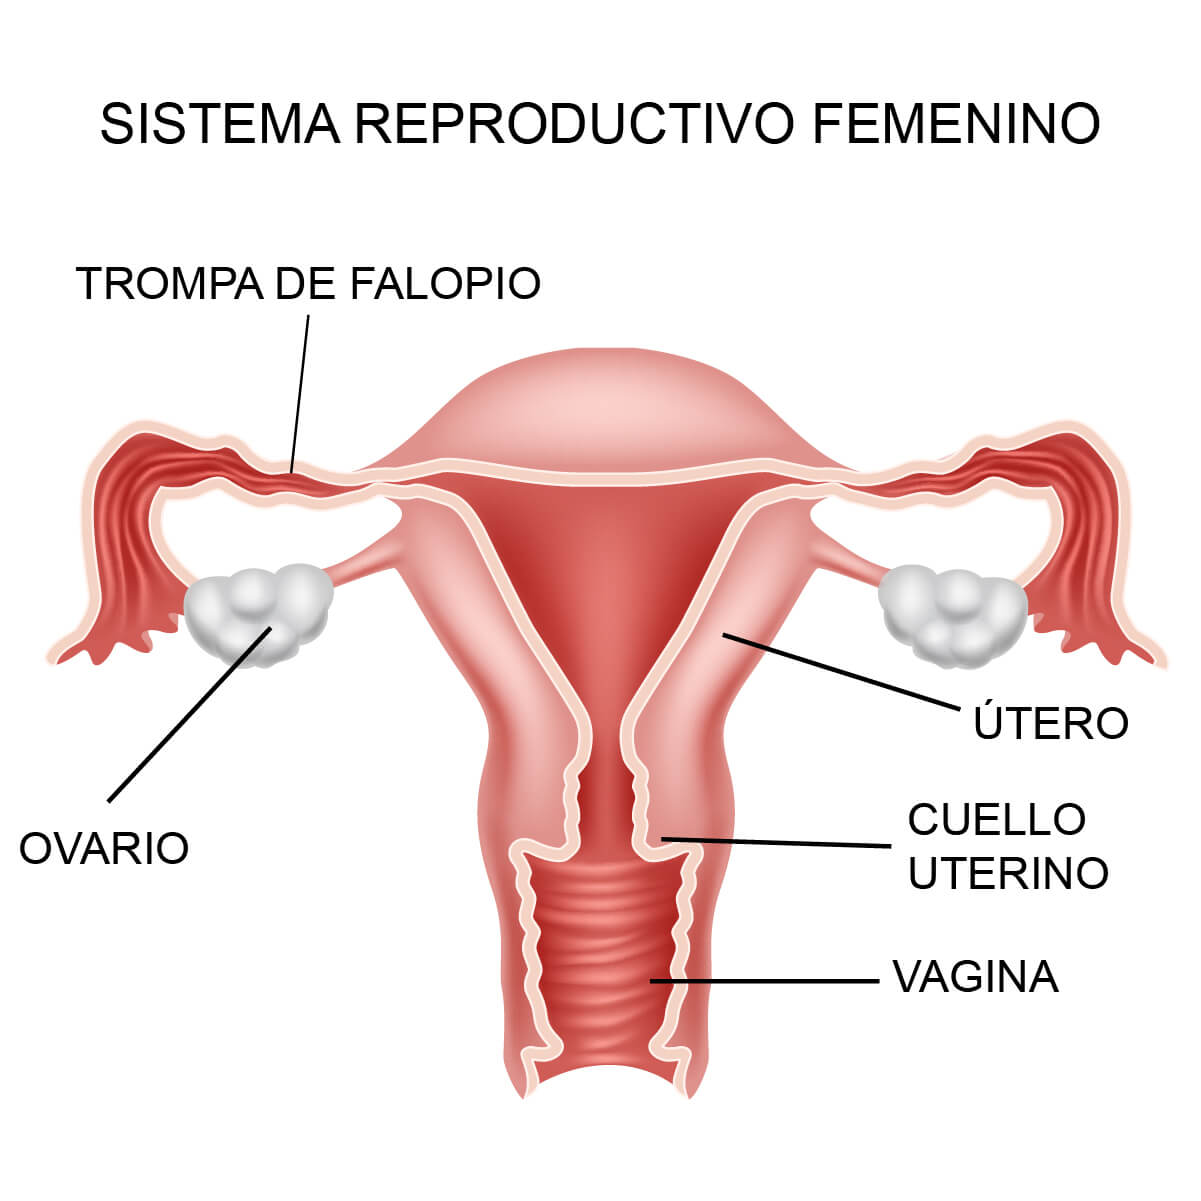 sistema-reproductivo-femenino.jpg